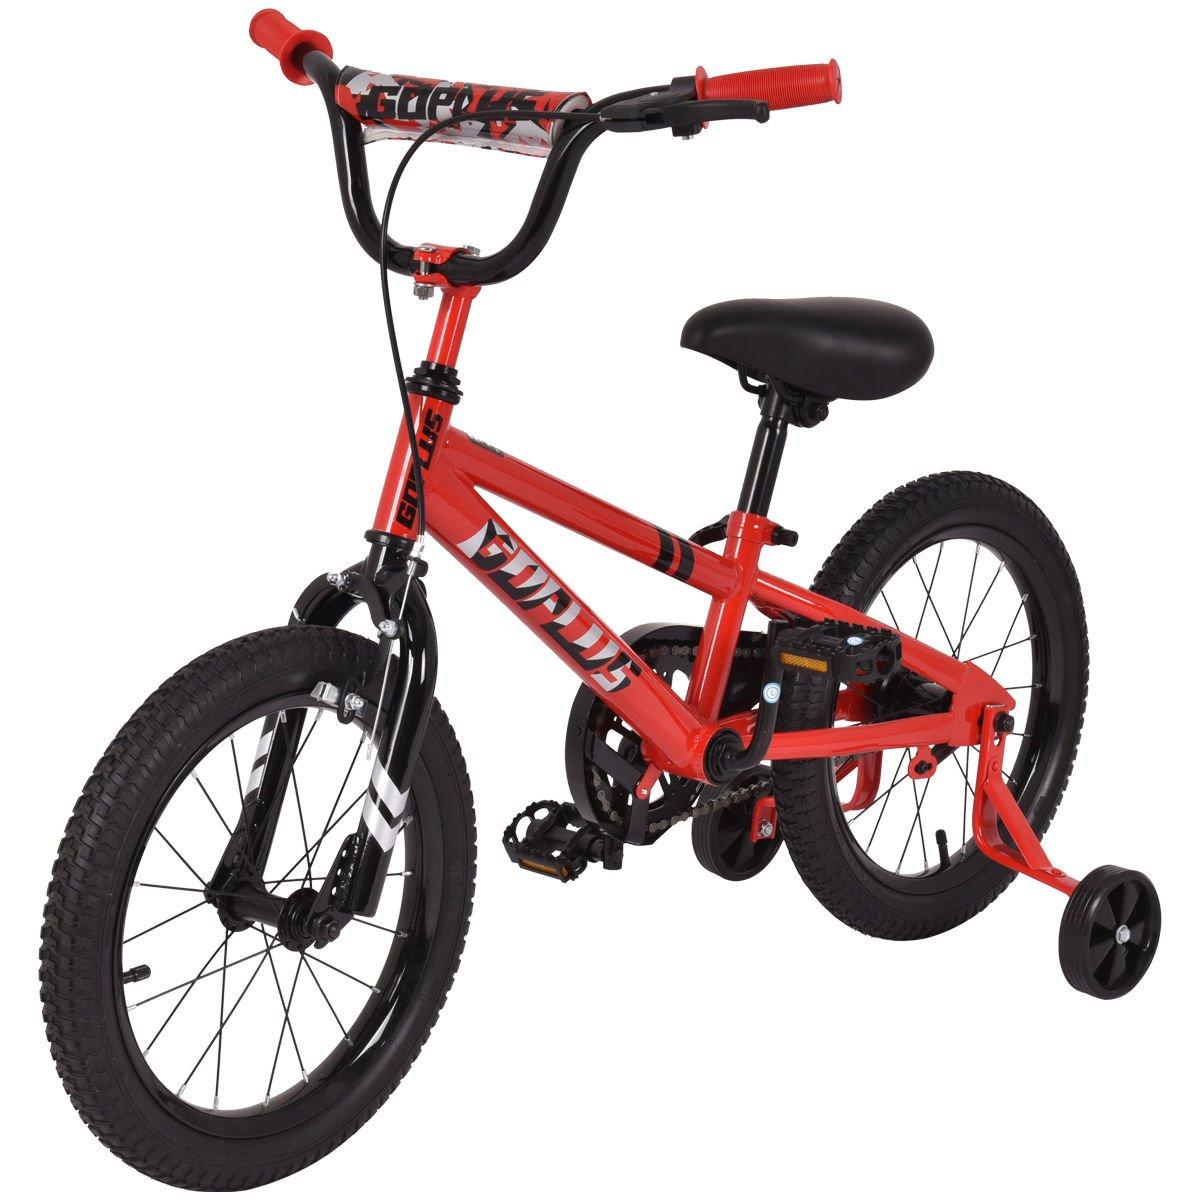 Goplus 16'' Kids Bike Bicycle, Boy's Bike and Girl's Bike w/Training Wheels, Toddler Ride, Gifts for Children (Red)